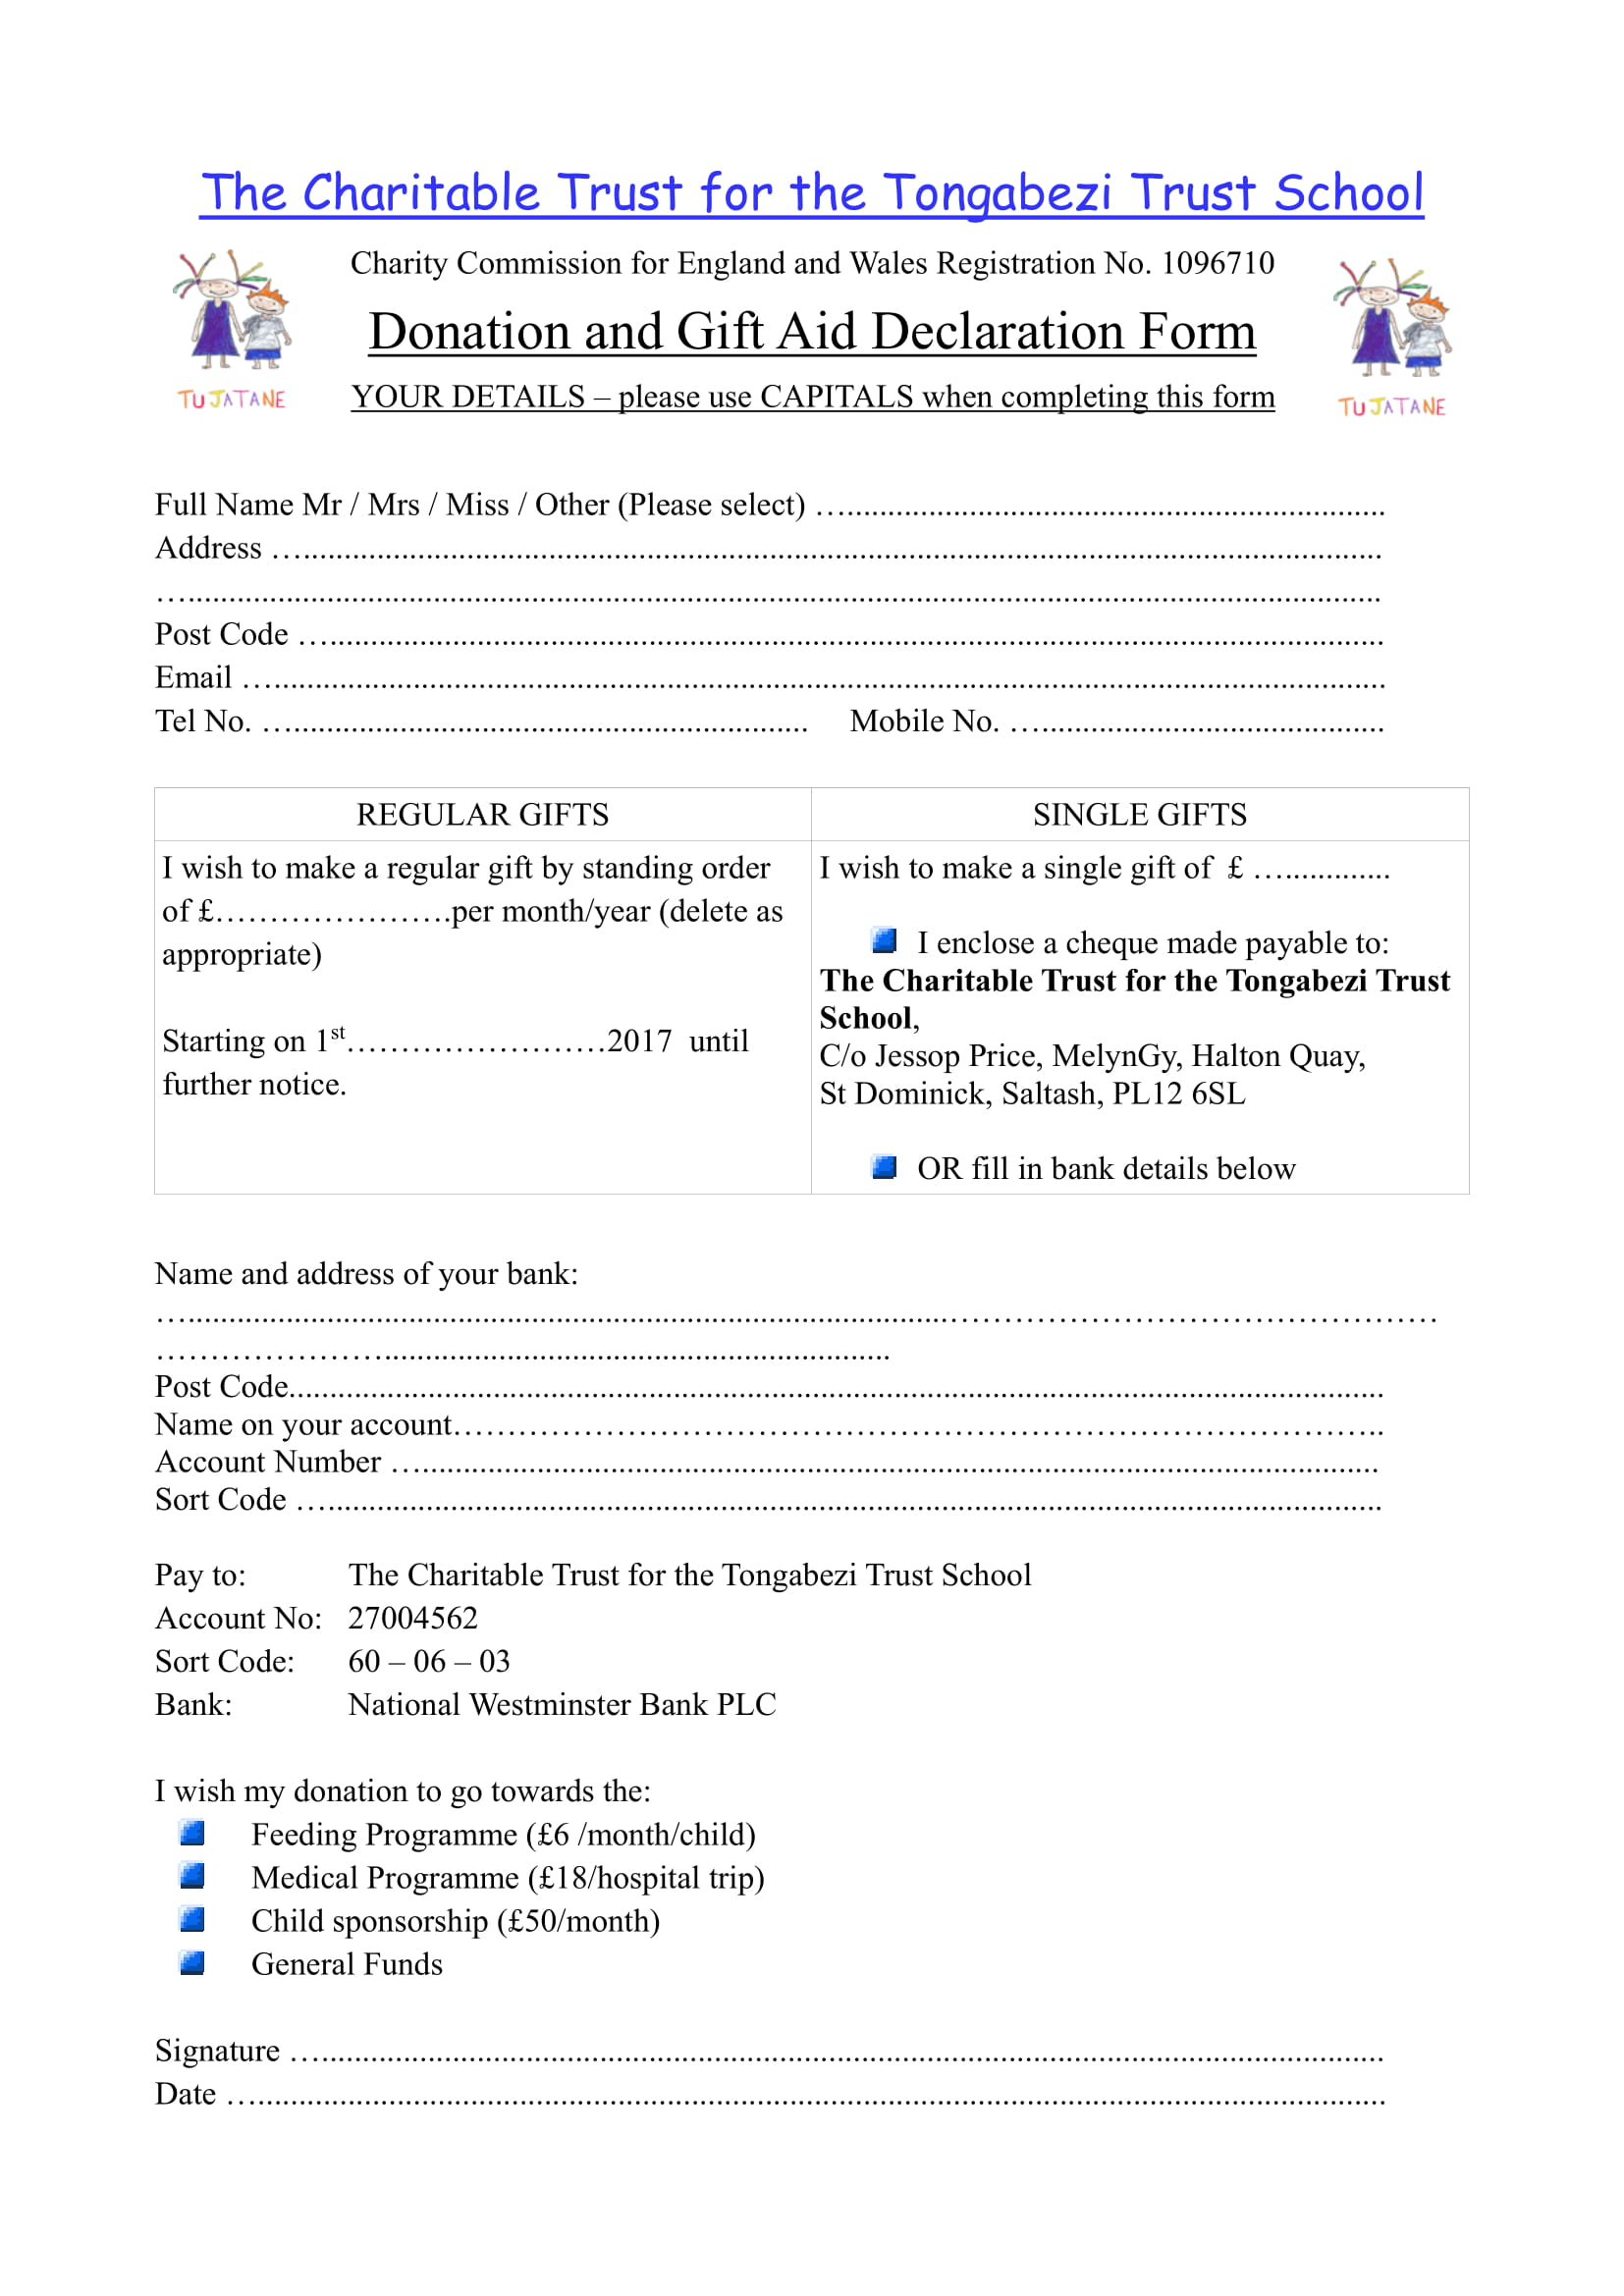 charitable trust donation form 1